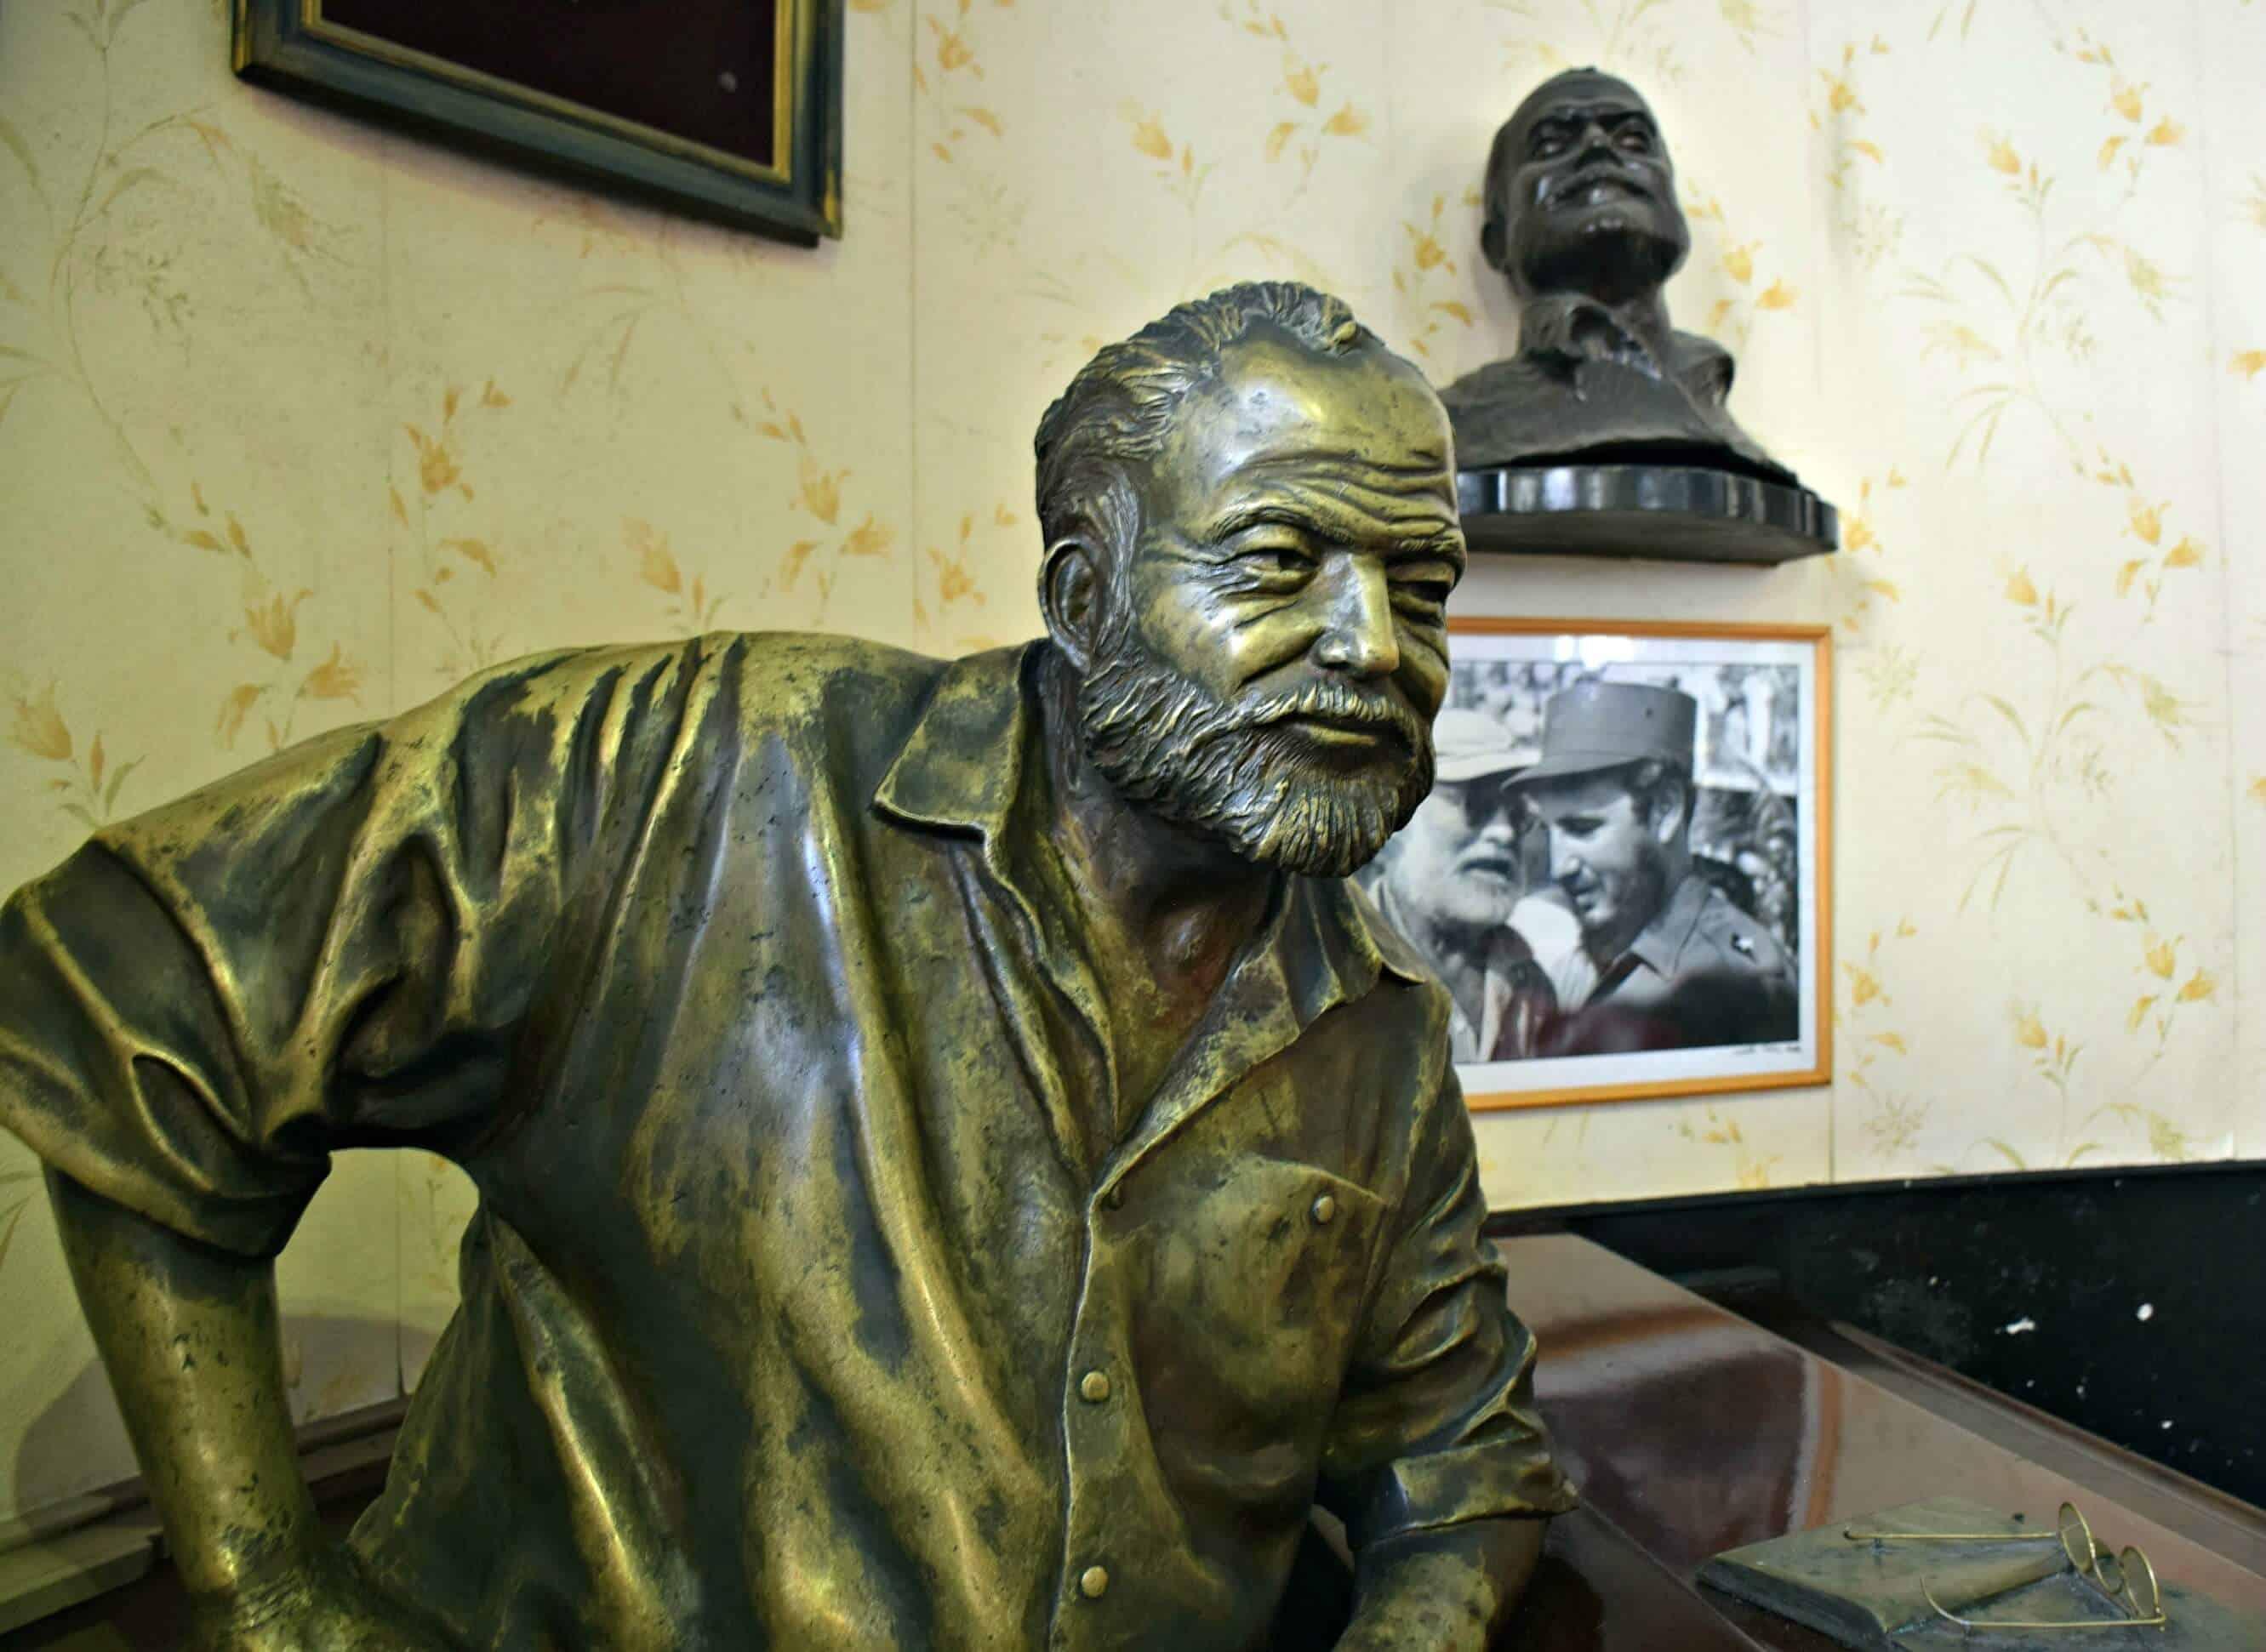 Hemingway Bust, Floridita, Havana, Cuba